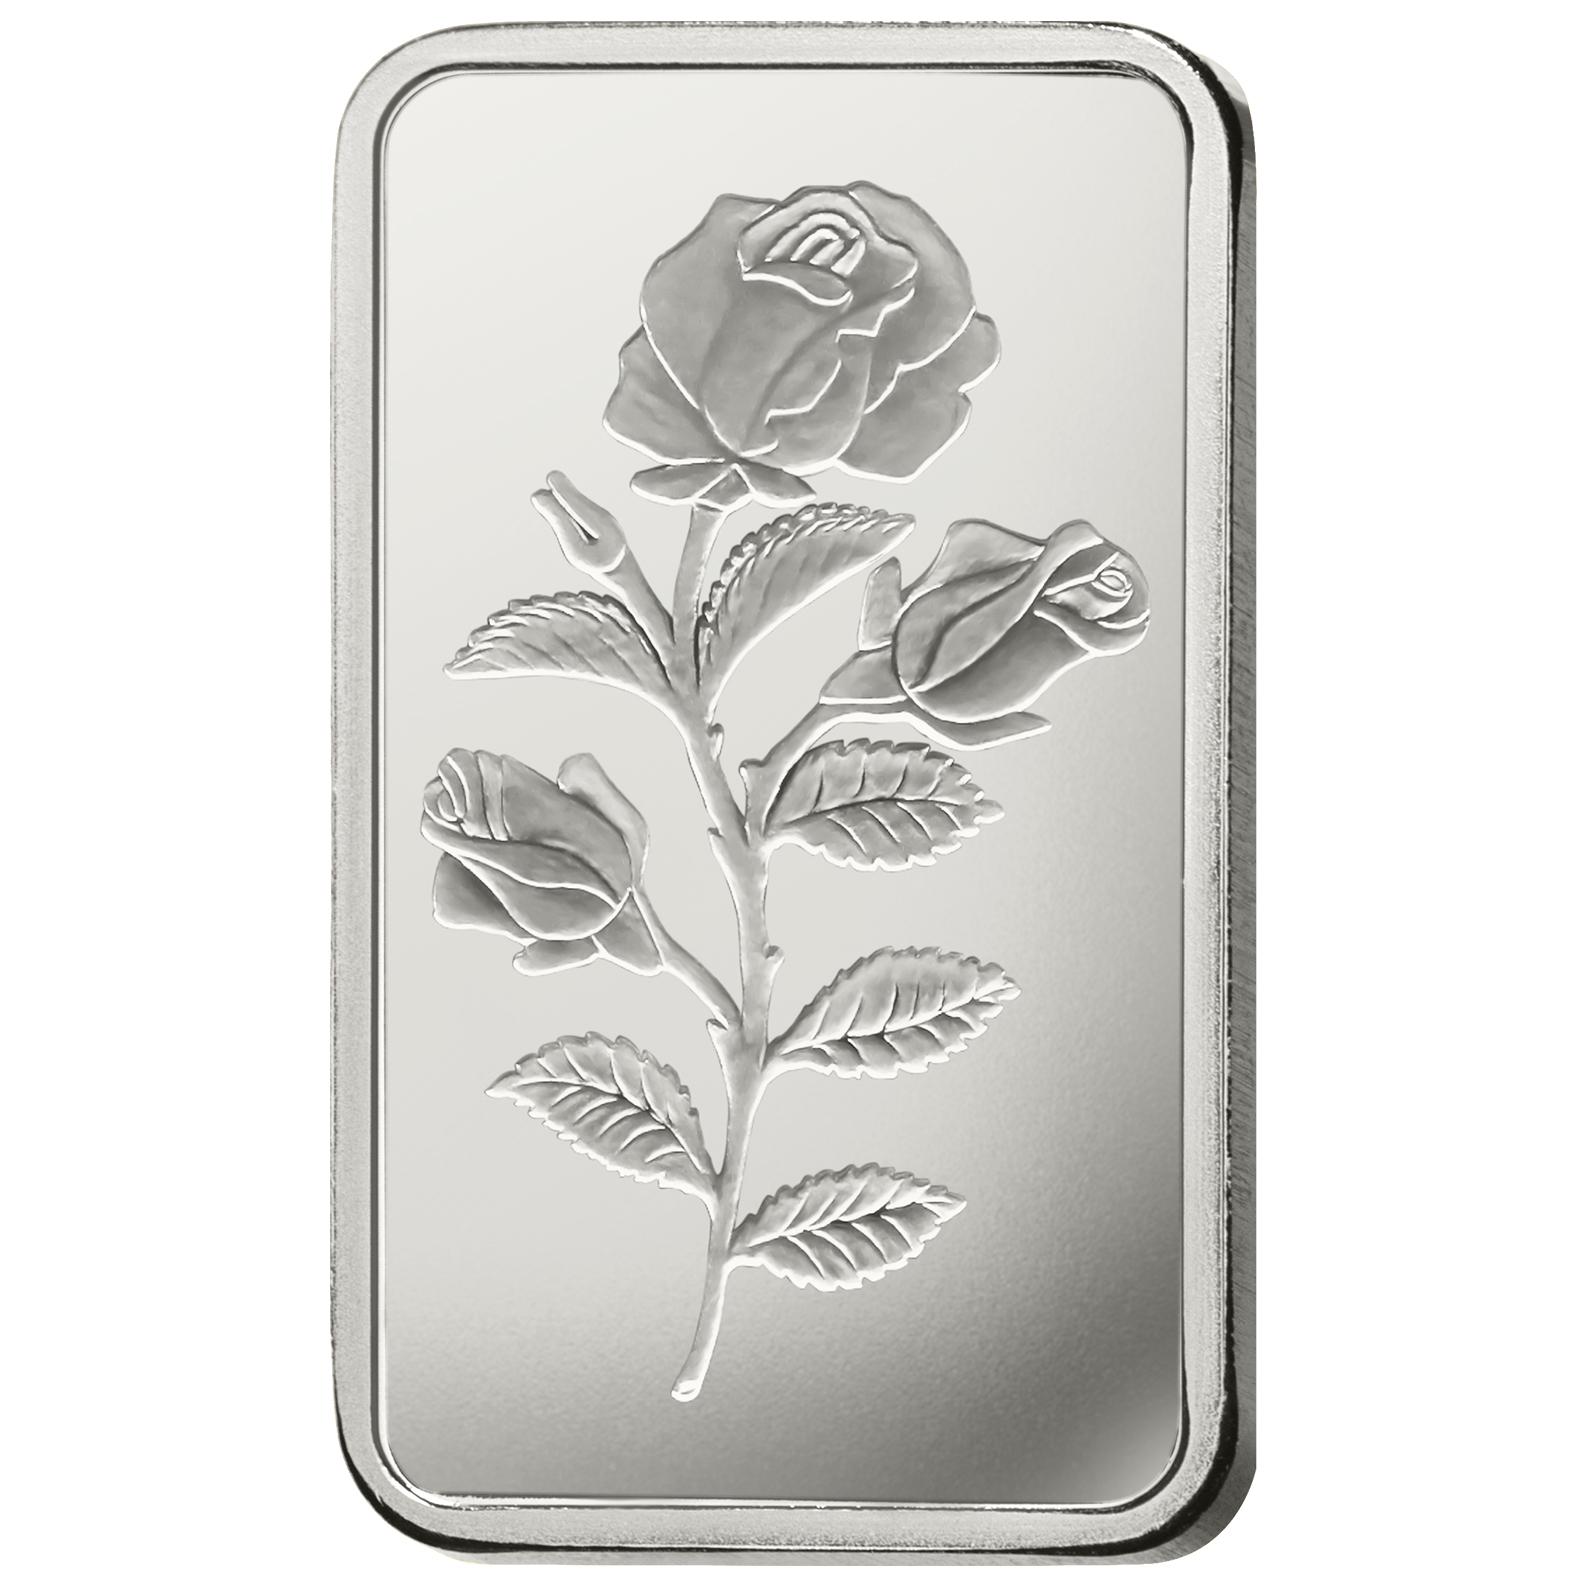 5 gram Silver Bar - PAMP Suisse Rosa